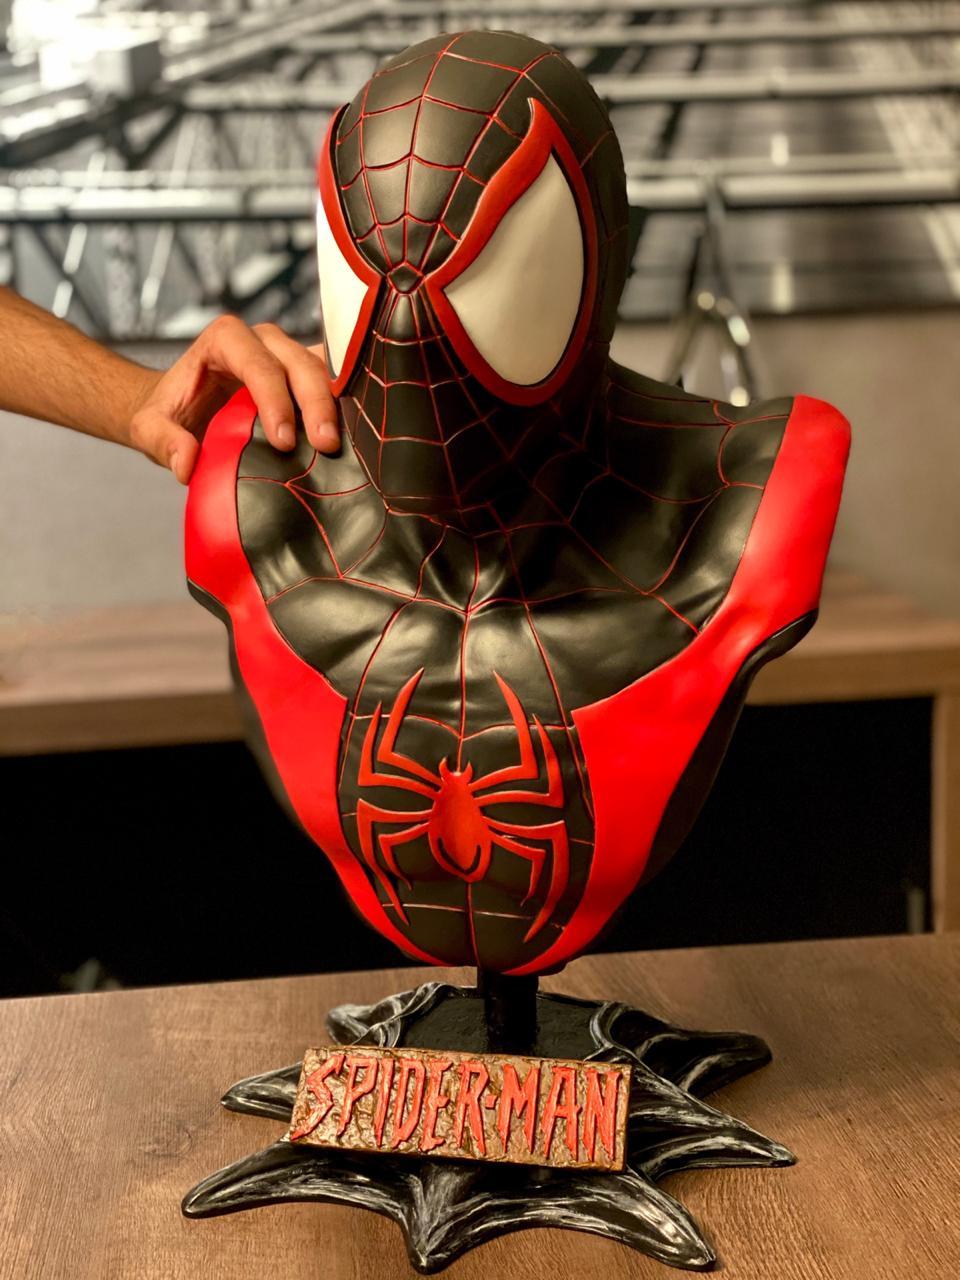 Busto Homem-Aranha (SpiderMan) Miles Morales: Homem-Aranha no Aranhaverso (Spider-Man Into the Spider-Verse)